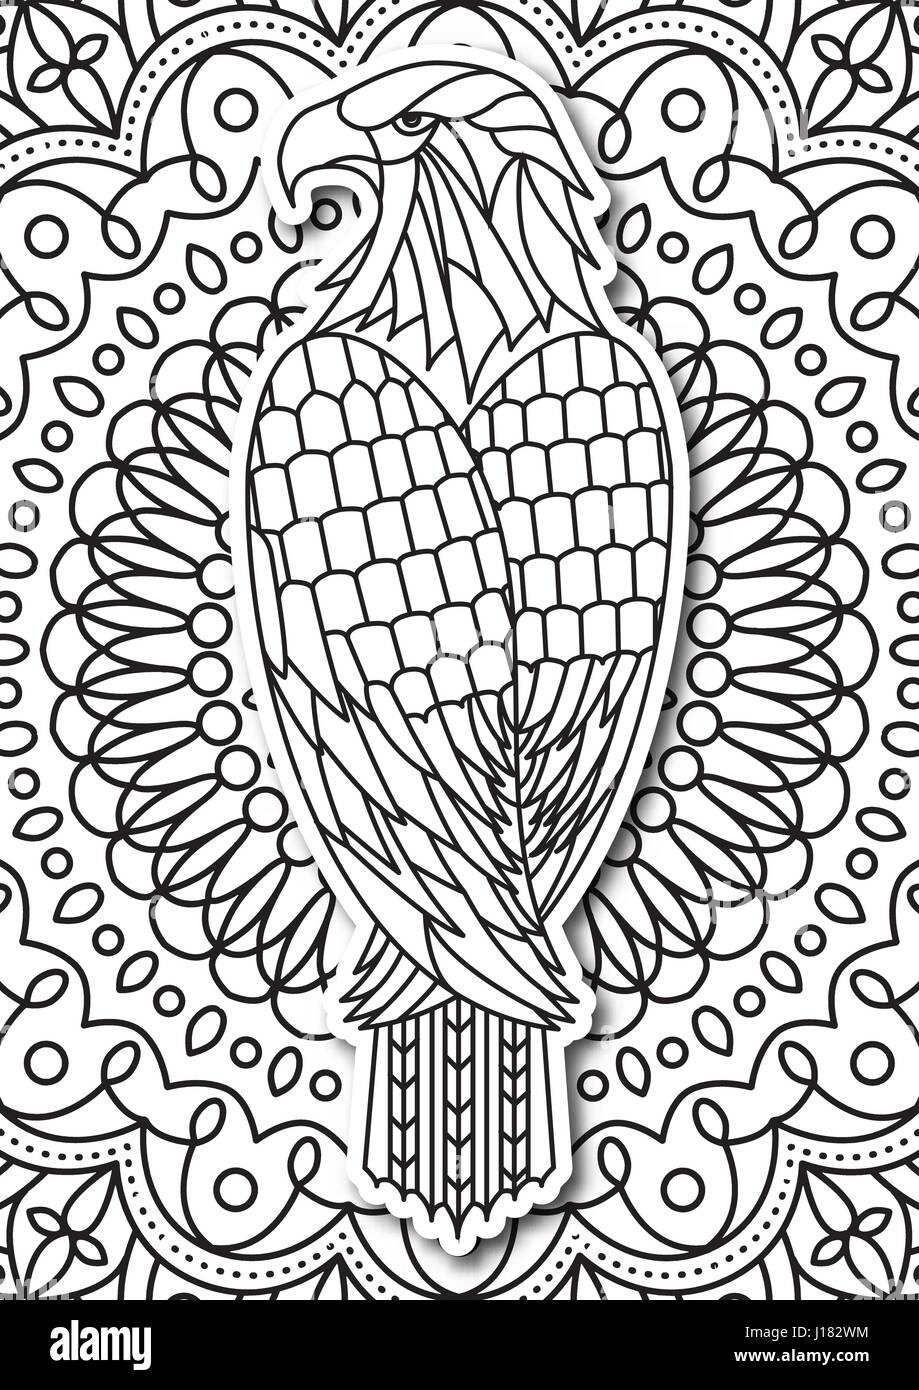 Drawn Eagle Stock Photos Images